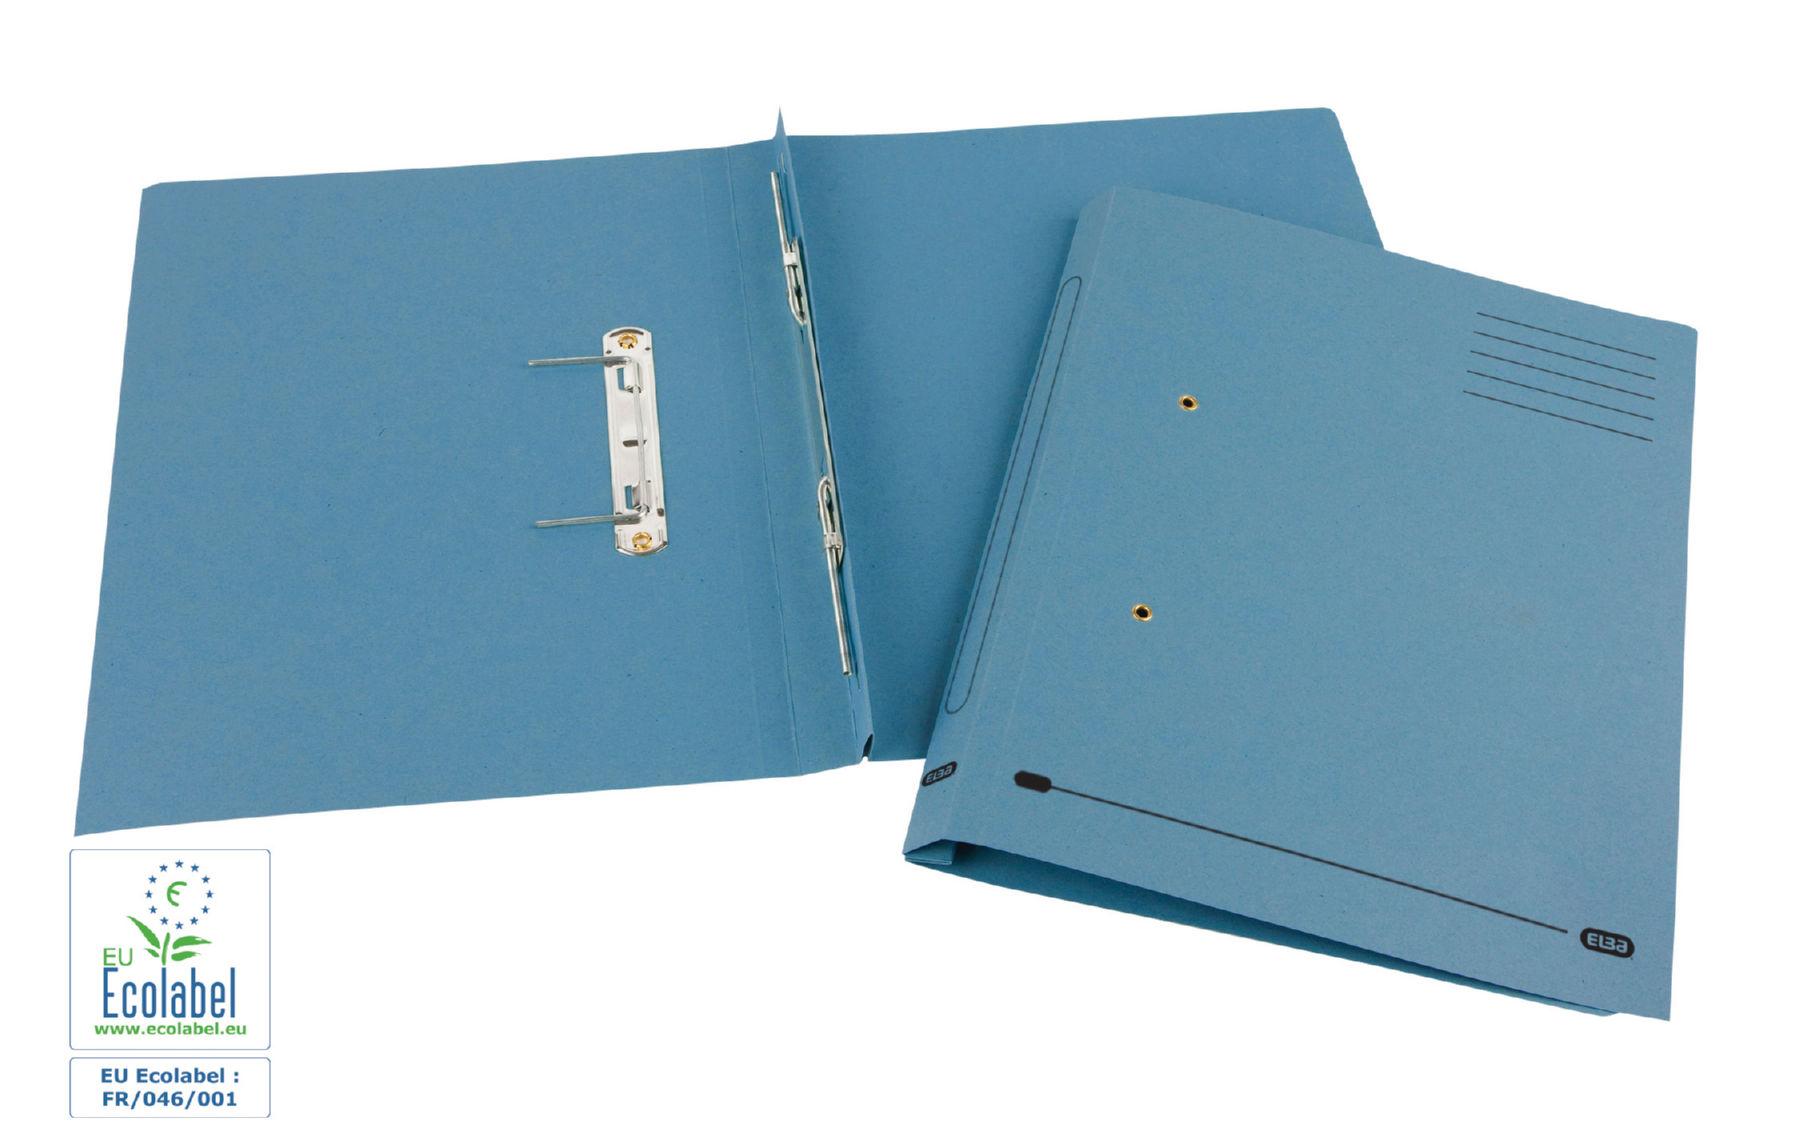 Square Cut Folders Elba Spring Transfer File Manilla Foolscap 285gsm Blue (Pack 25)